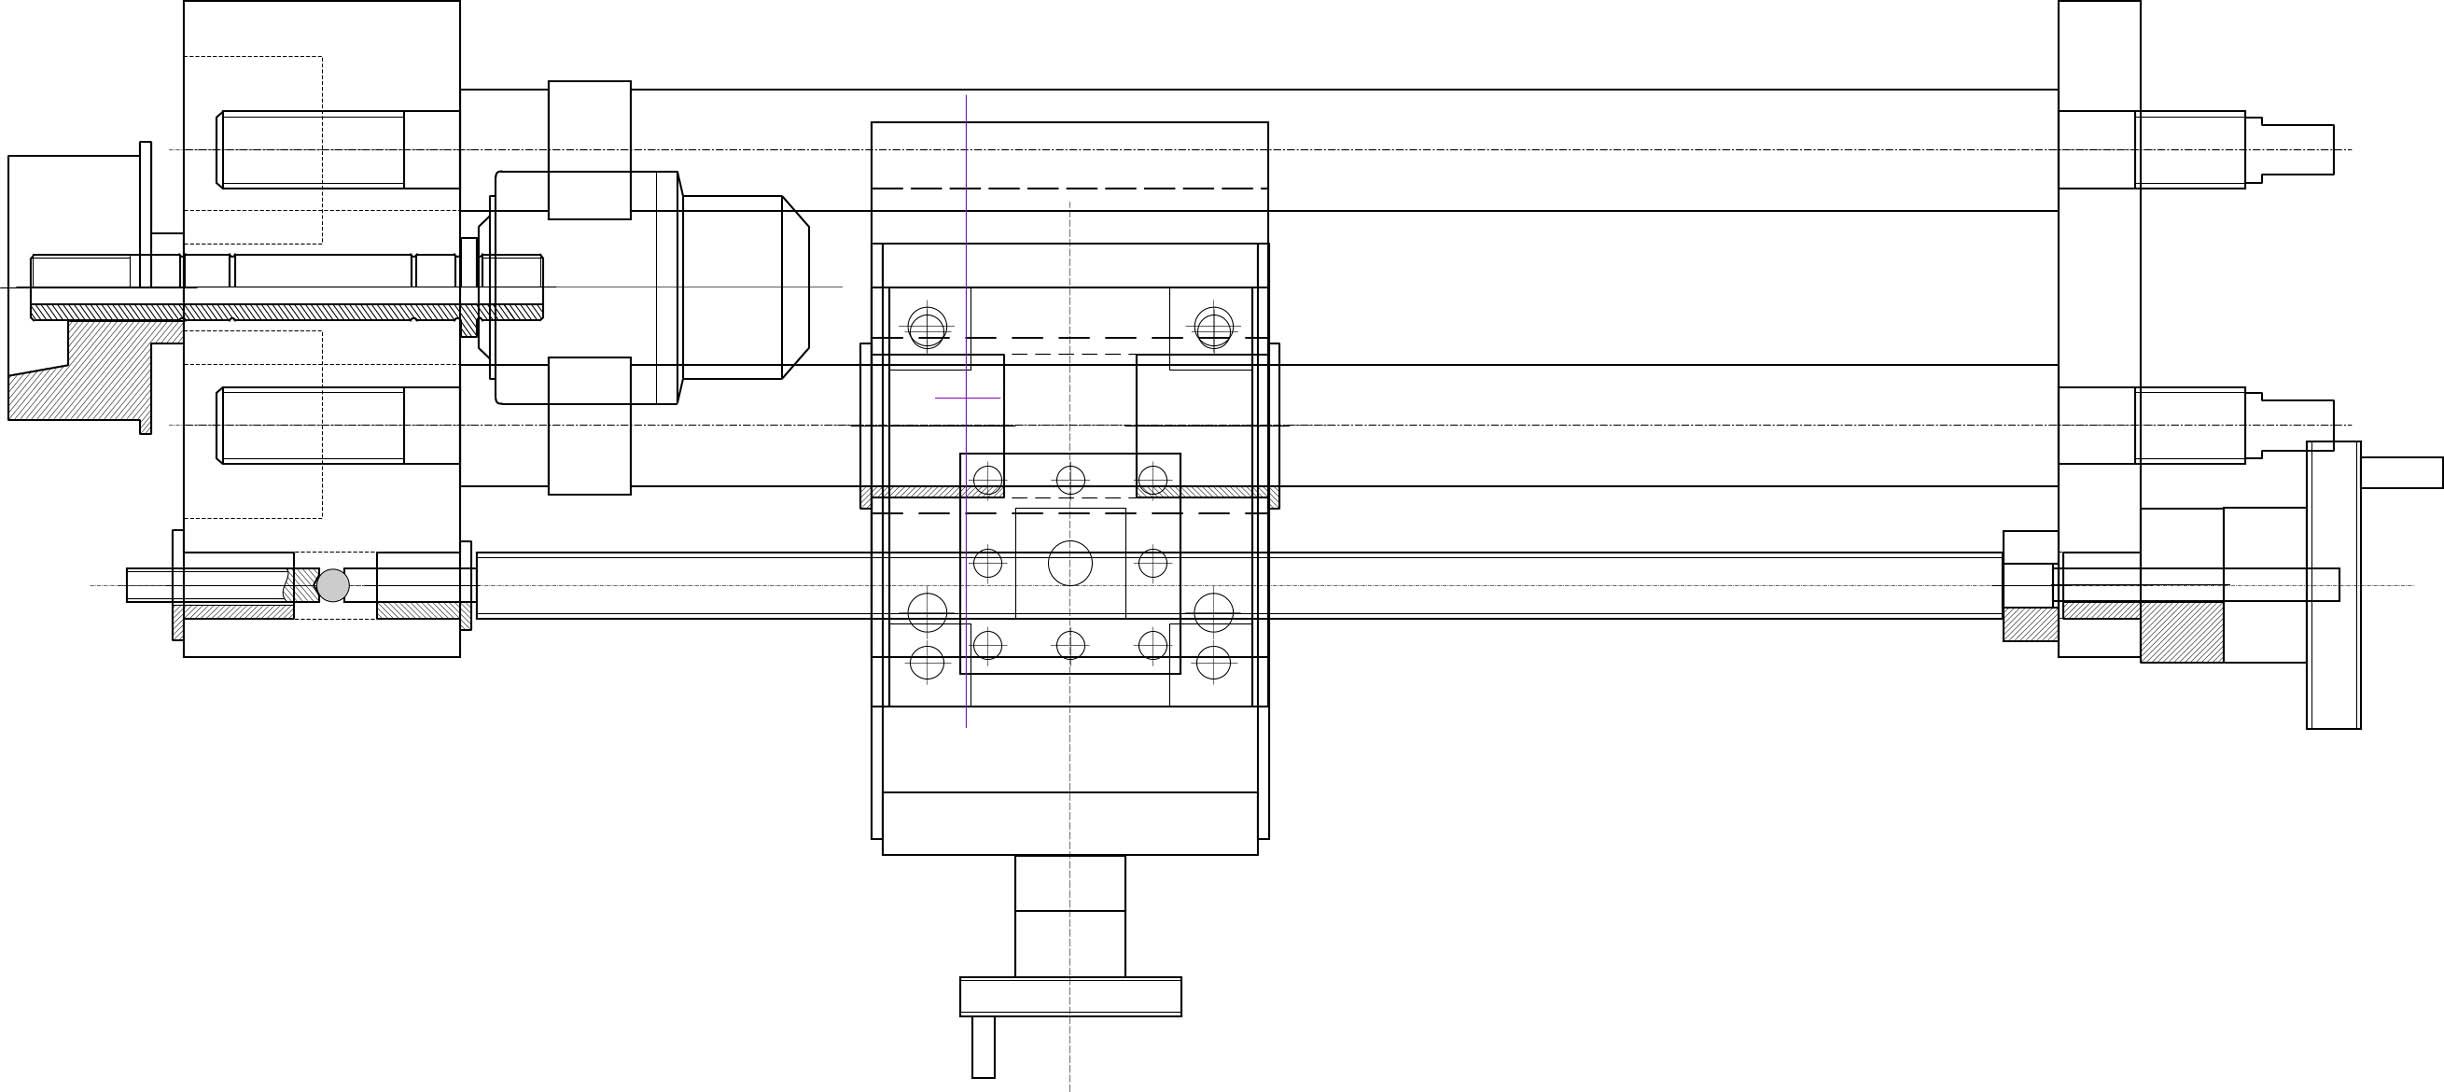 Токарный станок по металлу своими руками чертежи с размерами фото 67